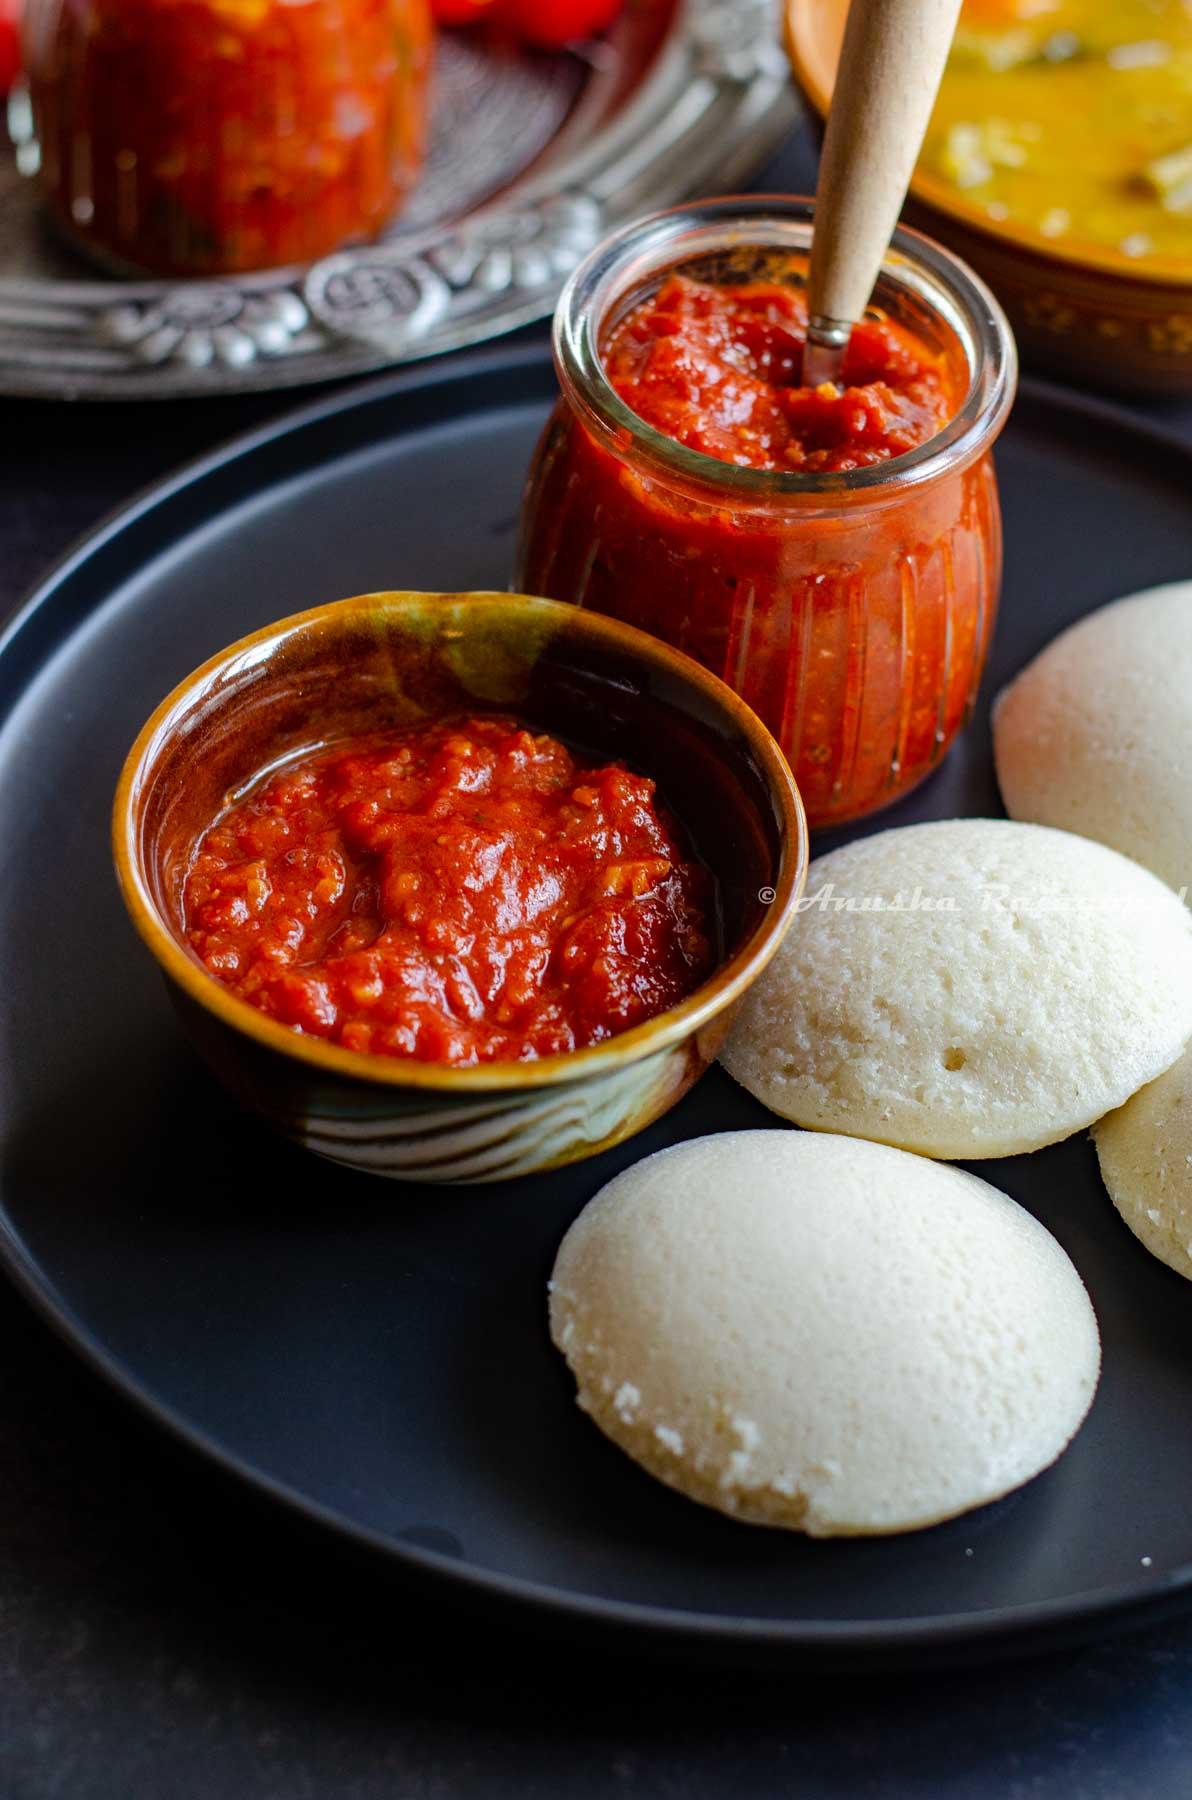 South Indian thakkali thokku- a tangy tomato relish served with soft idli